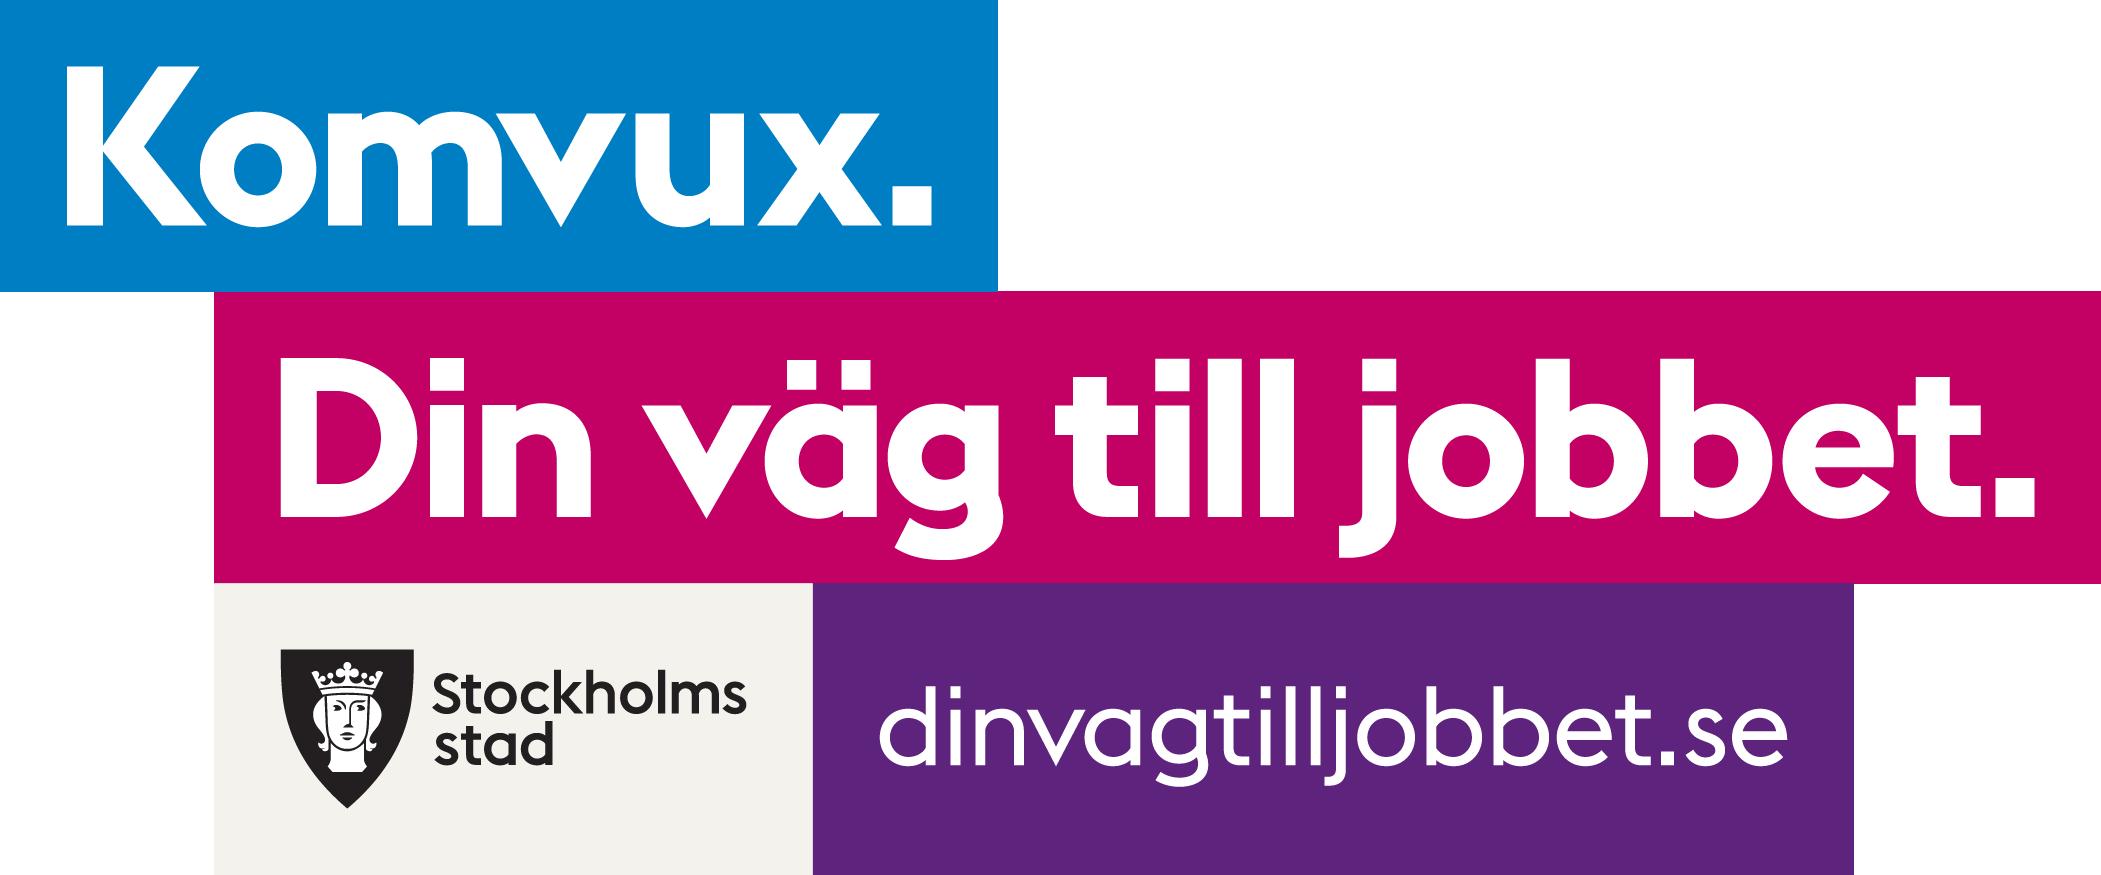 stockholms stad komvux